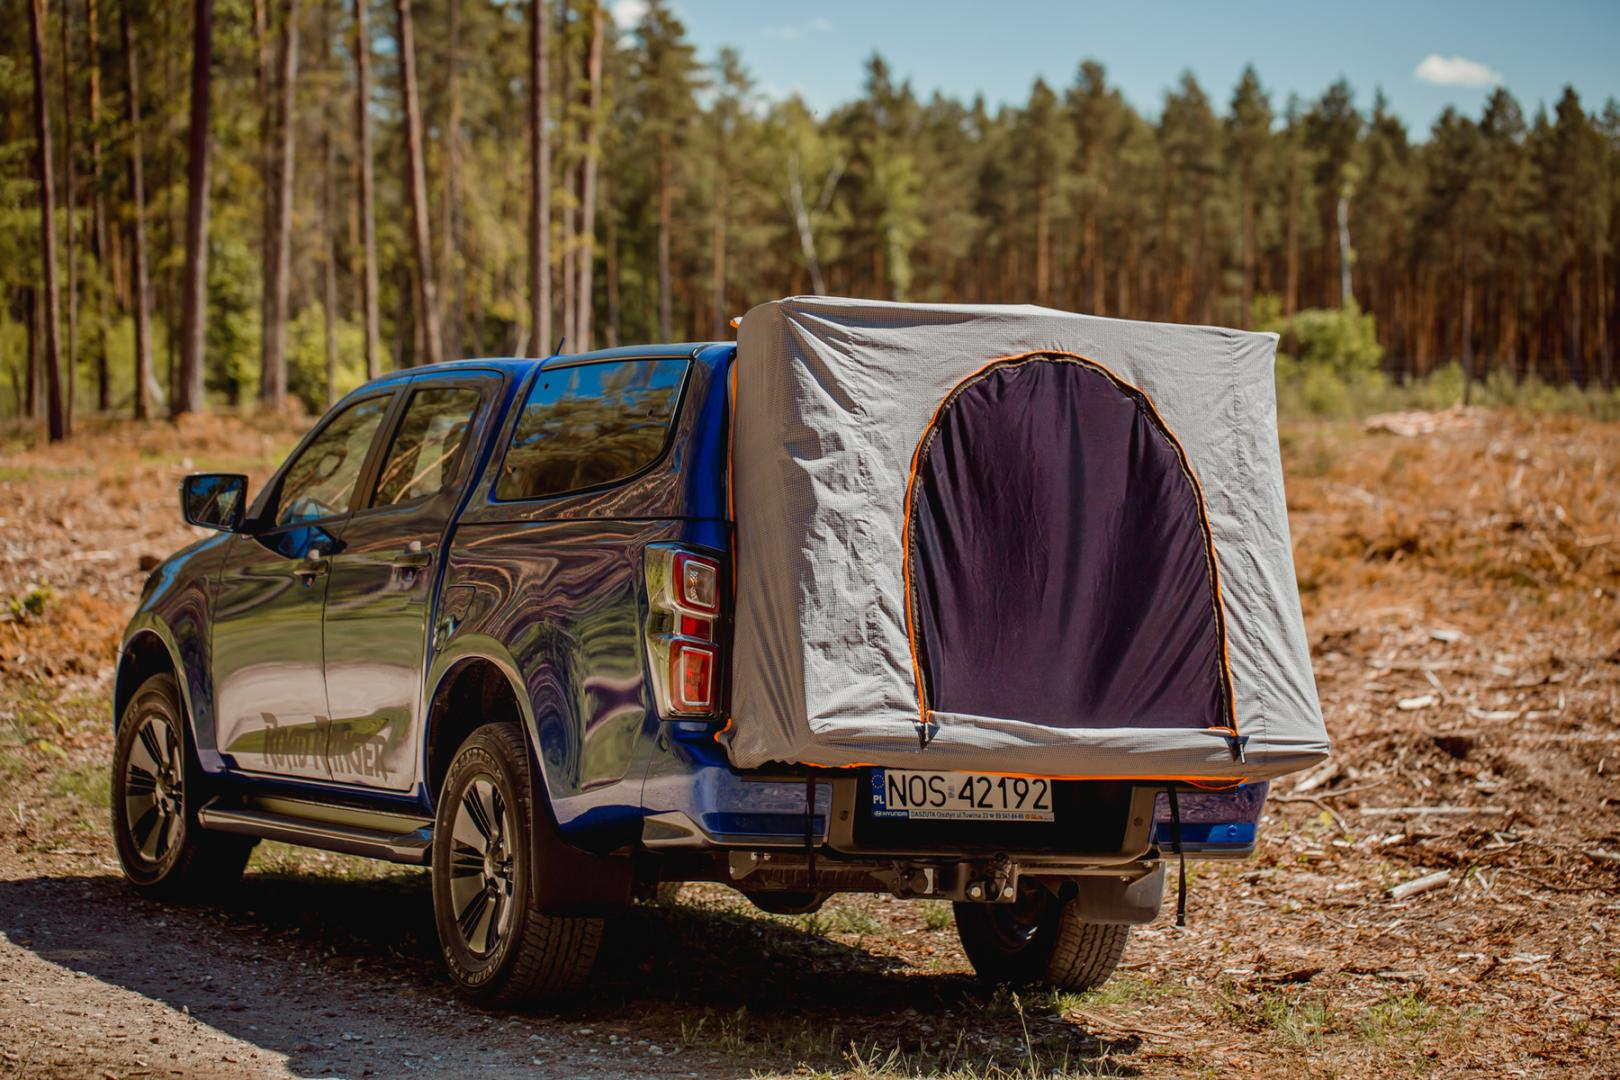 Fuß-Pack-Zelt Isuzu D-Max RH5 Camping